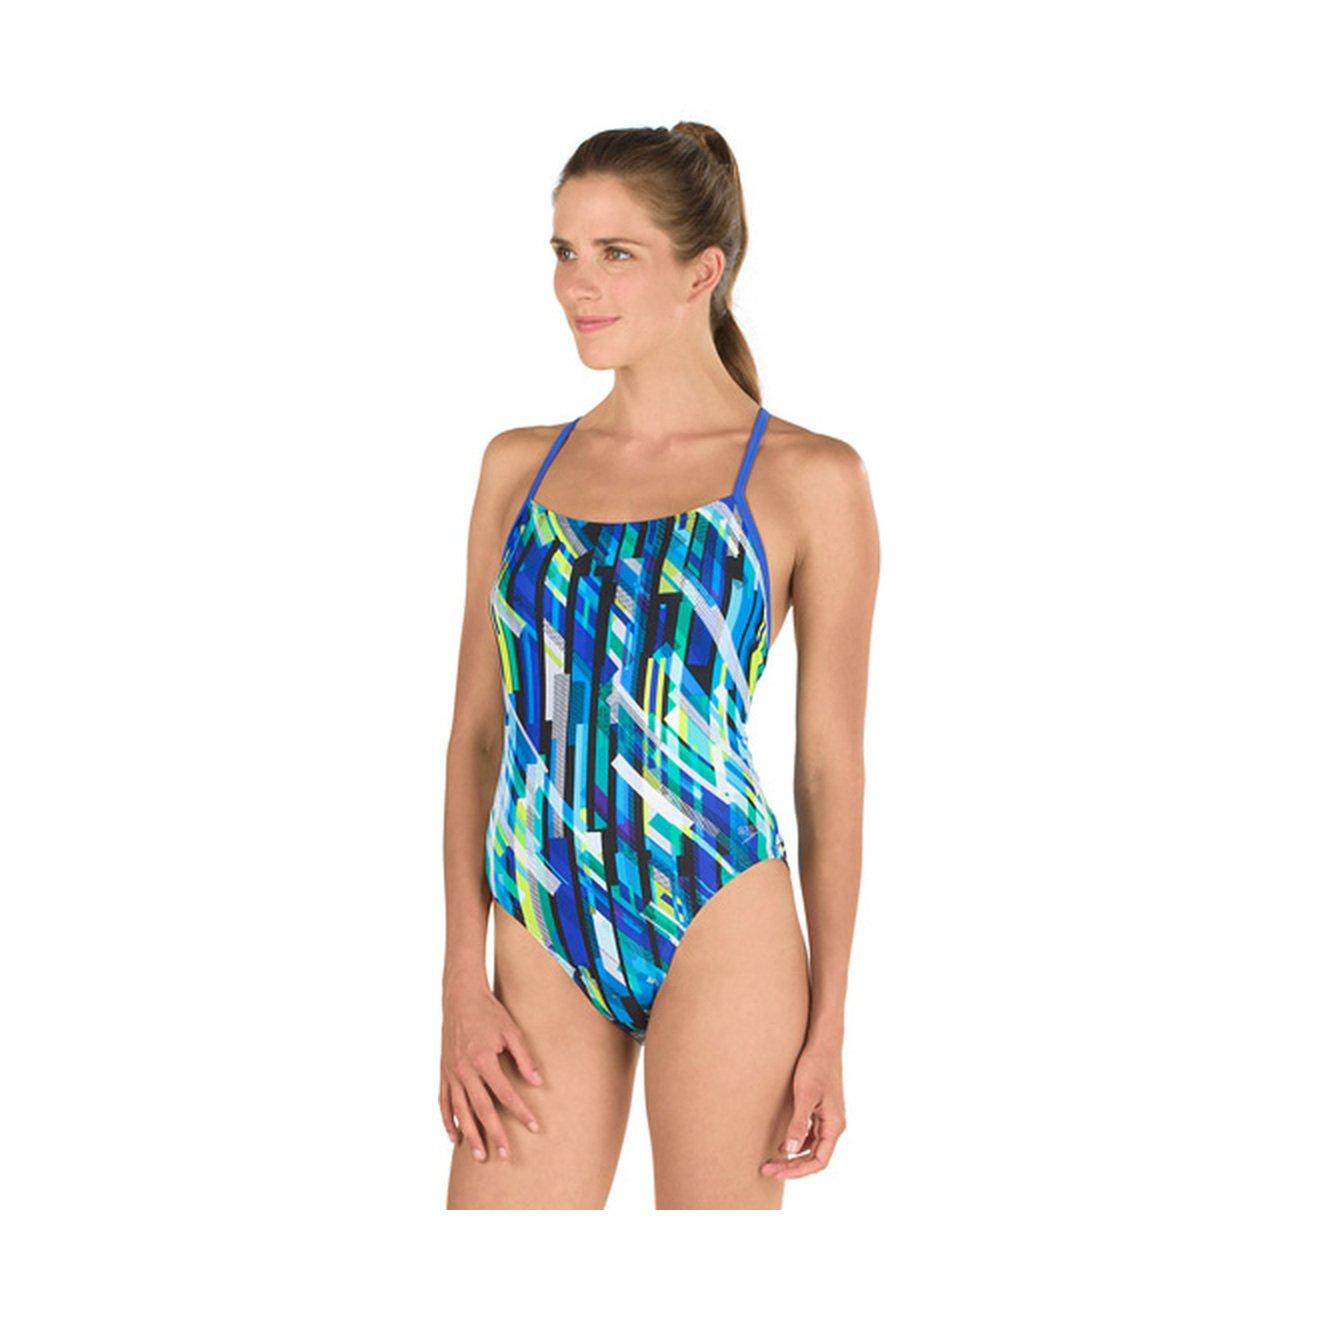 Speedo Geo嵐リレーBack Pro LT One Piece Swimsuit B076F8N8W1 Size 14/40|Deep Peri